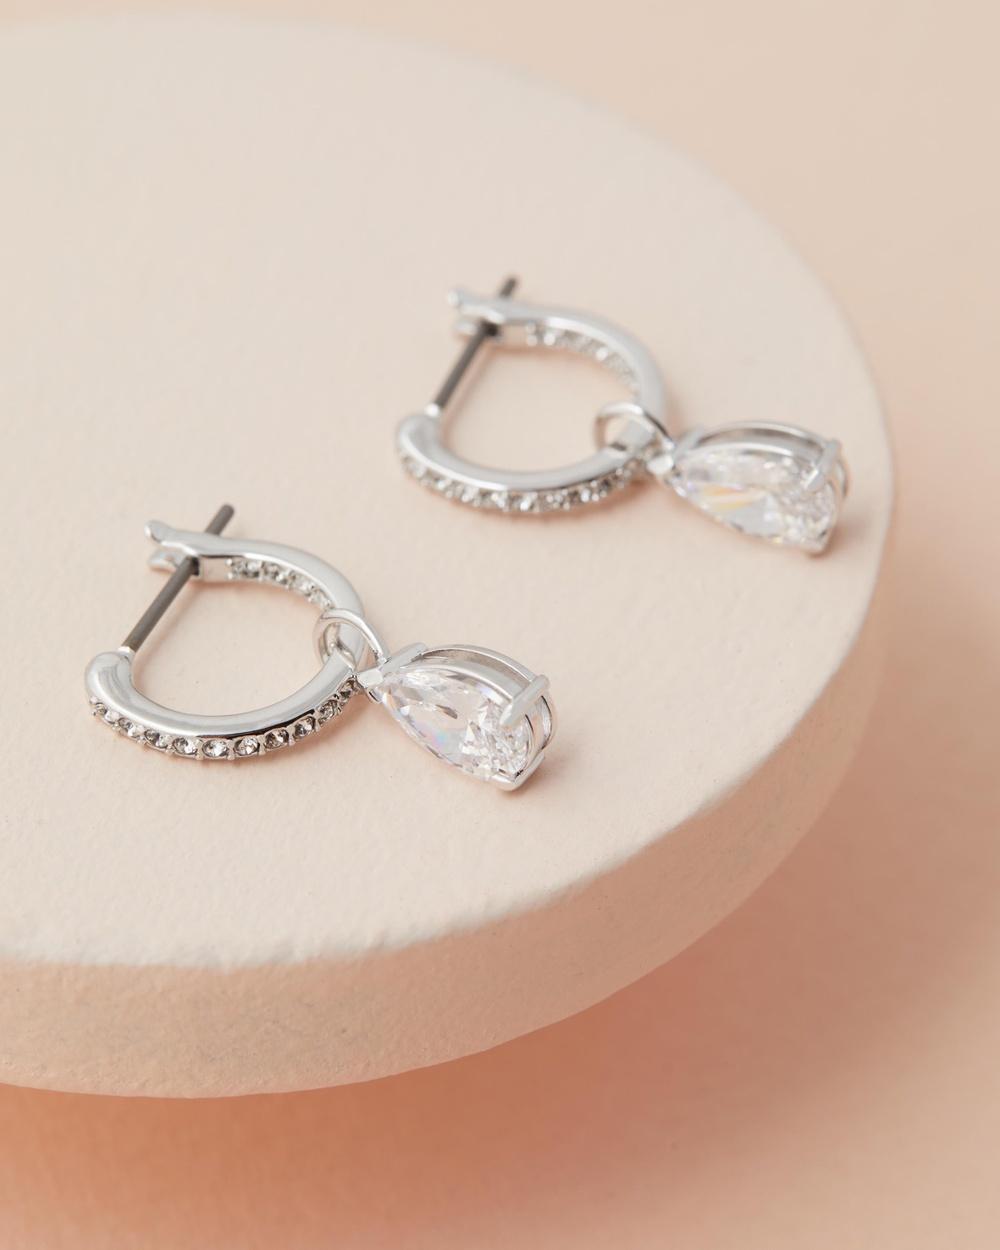 Swarovski Attract Mini Pear Hoop Earrings Jewellery CZ White & Rhodium Plating